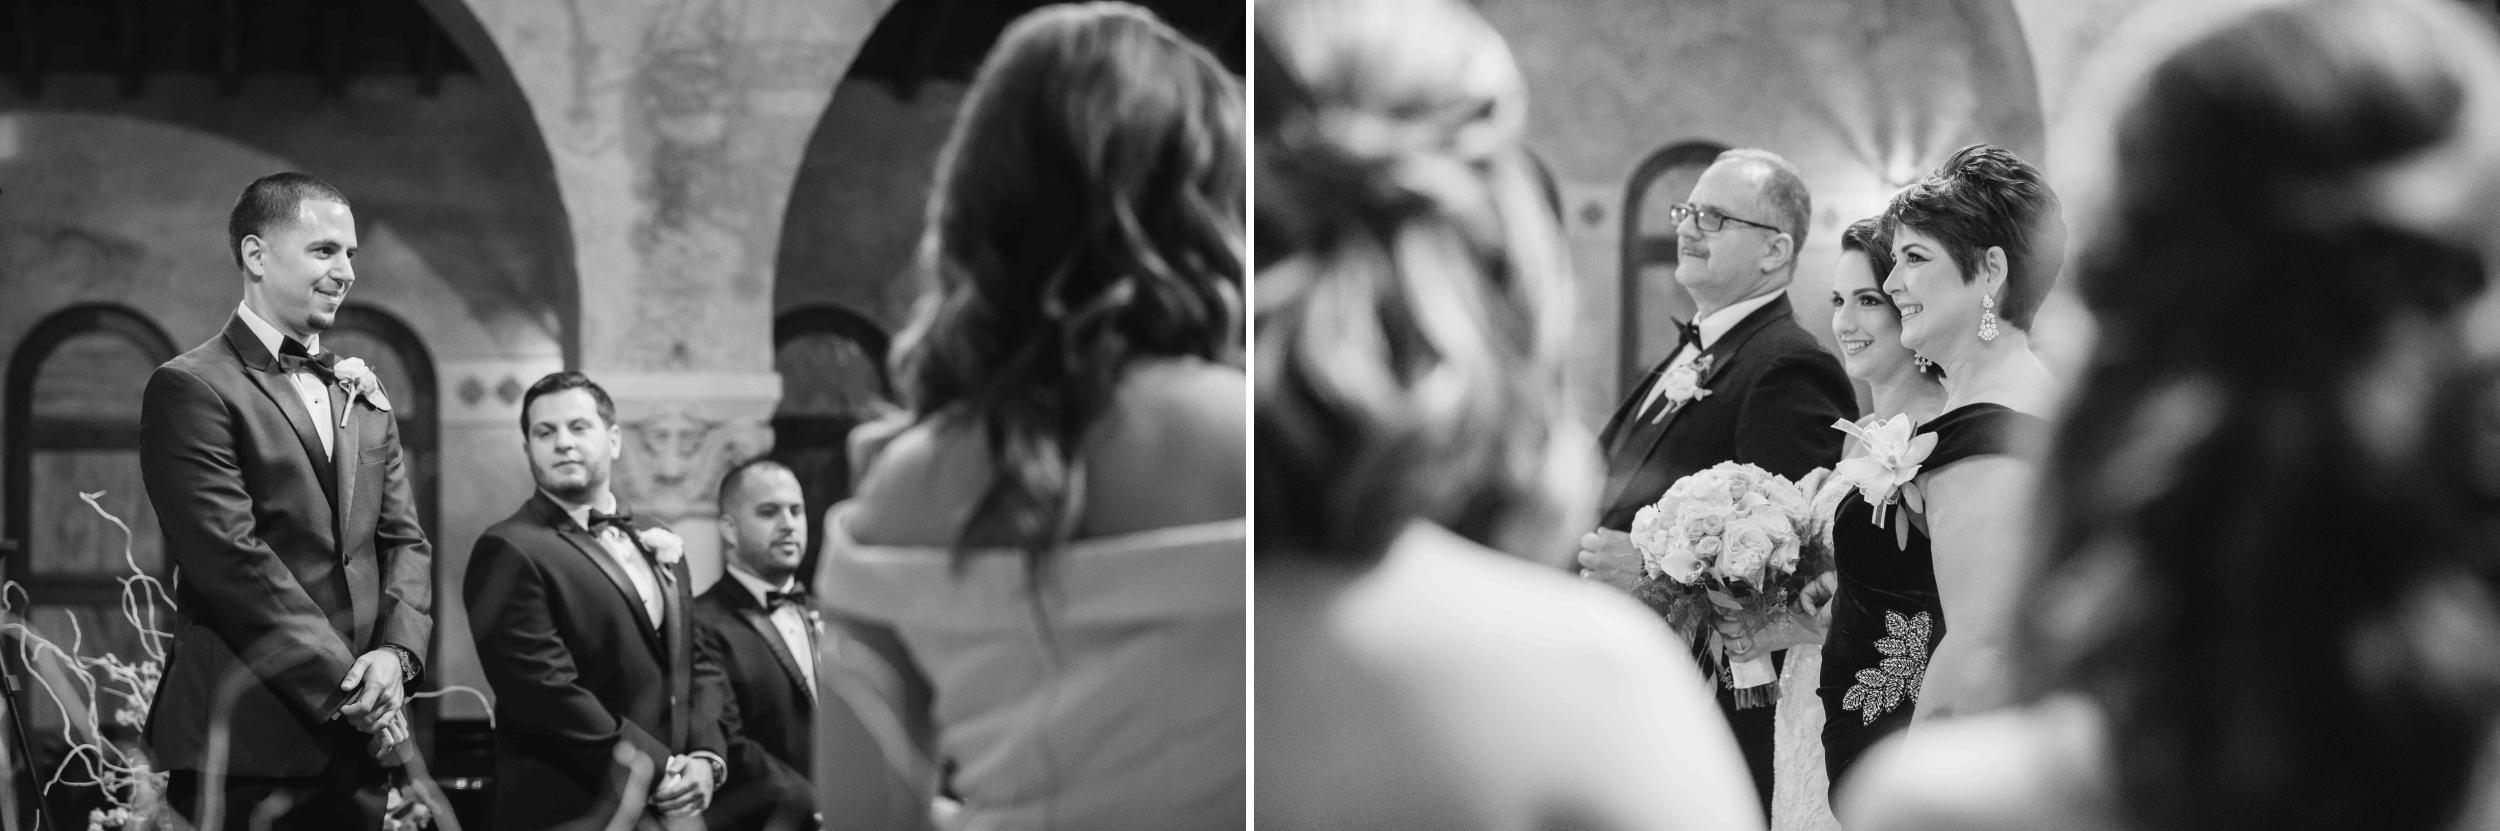 Wedding - Coco Plum - Coral Gables Congregational - Santy Martinez Photography 20.jpg